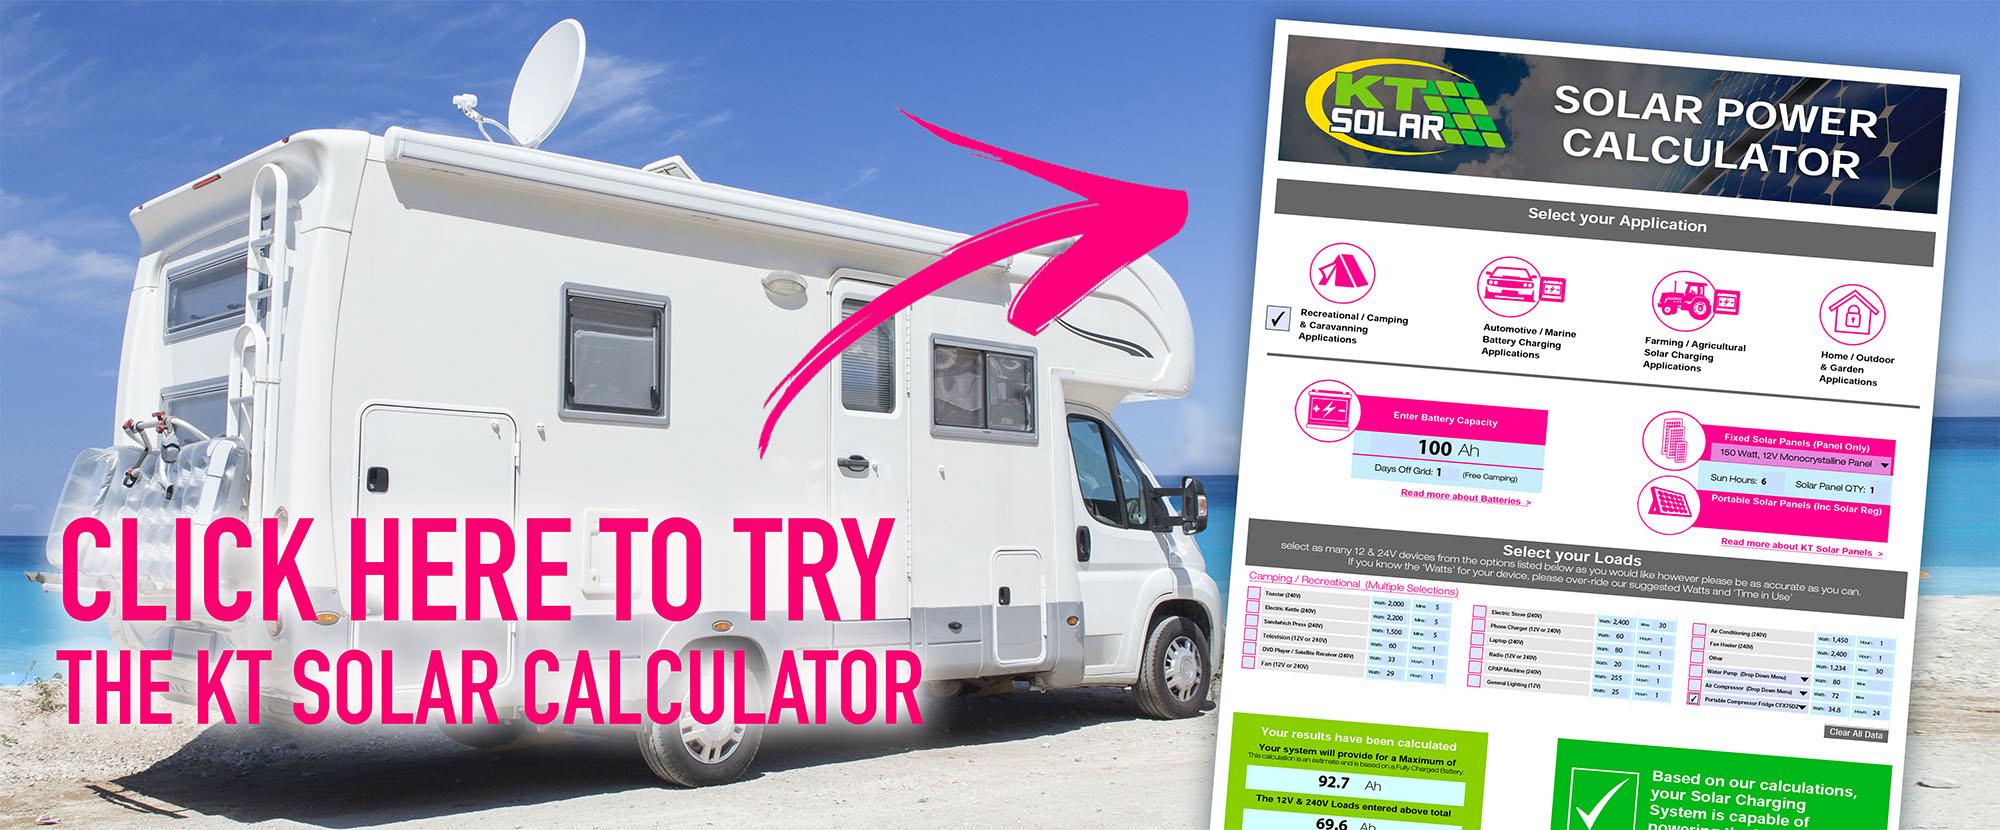 KT Solar Power Calculator - KT Cables